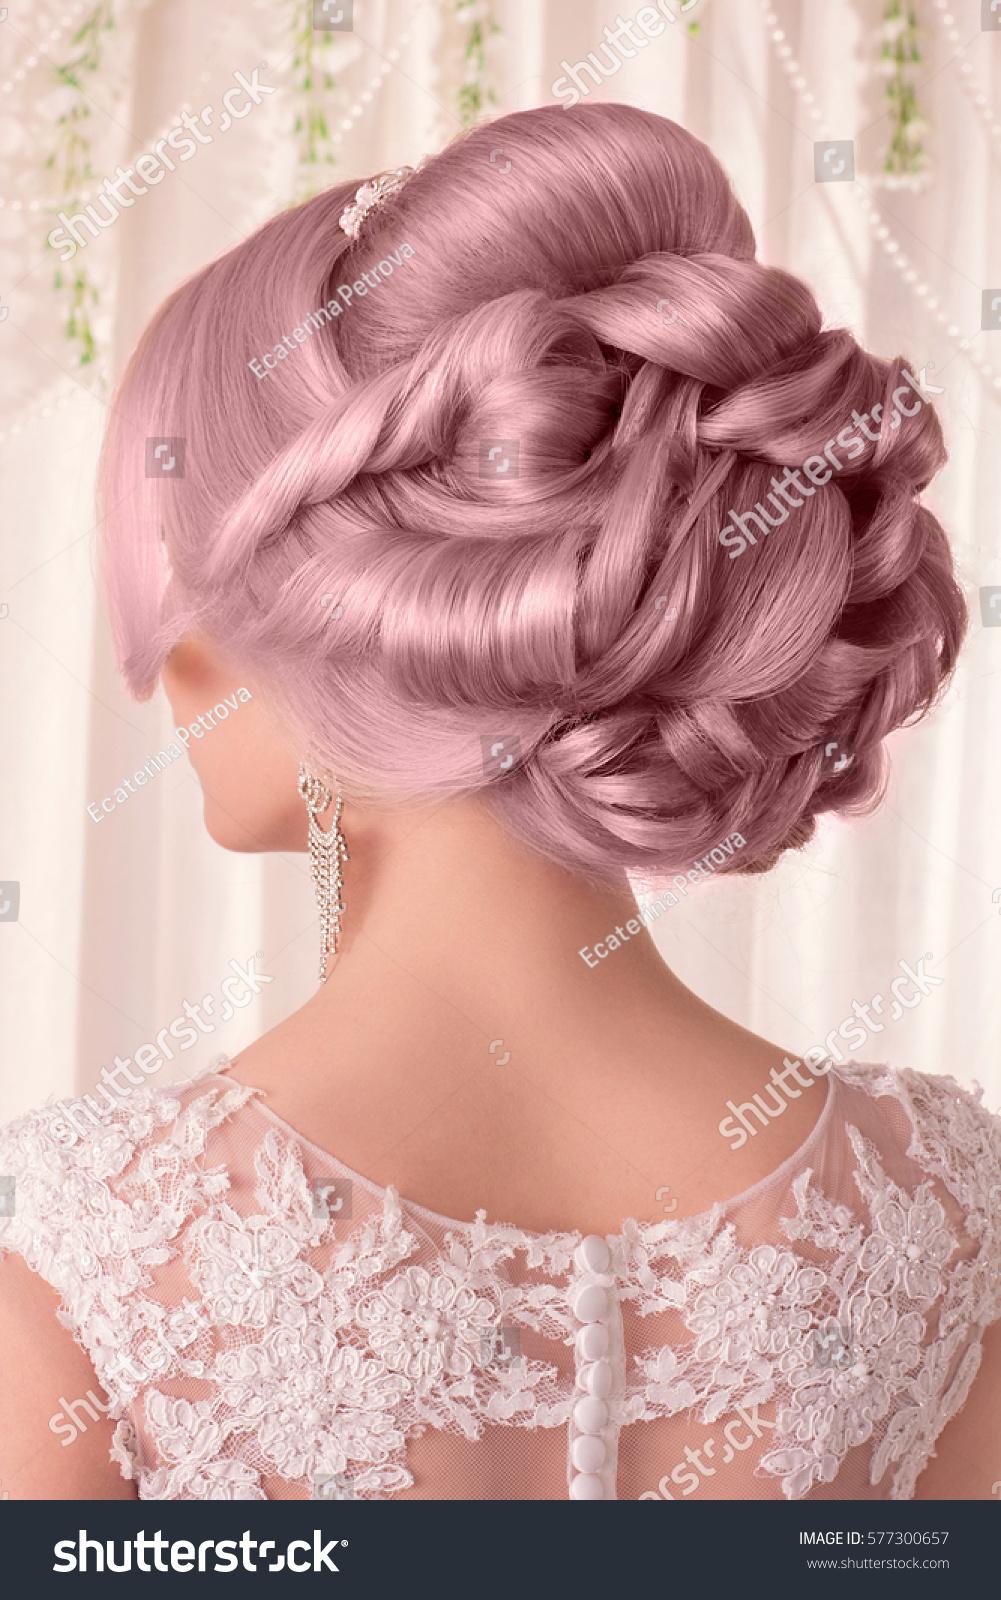 Beauty Wedding Hairstyle Bride Beauty Wedding Stock Photo (Edit Now ...